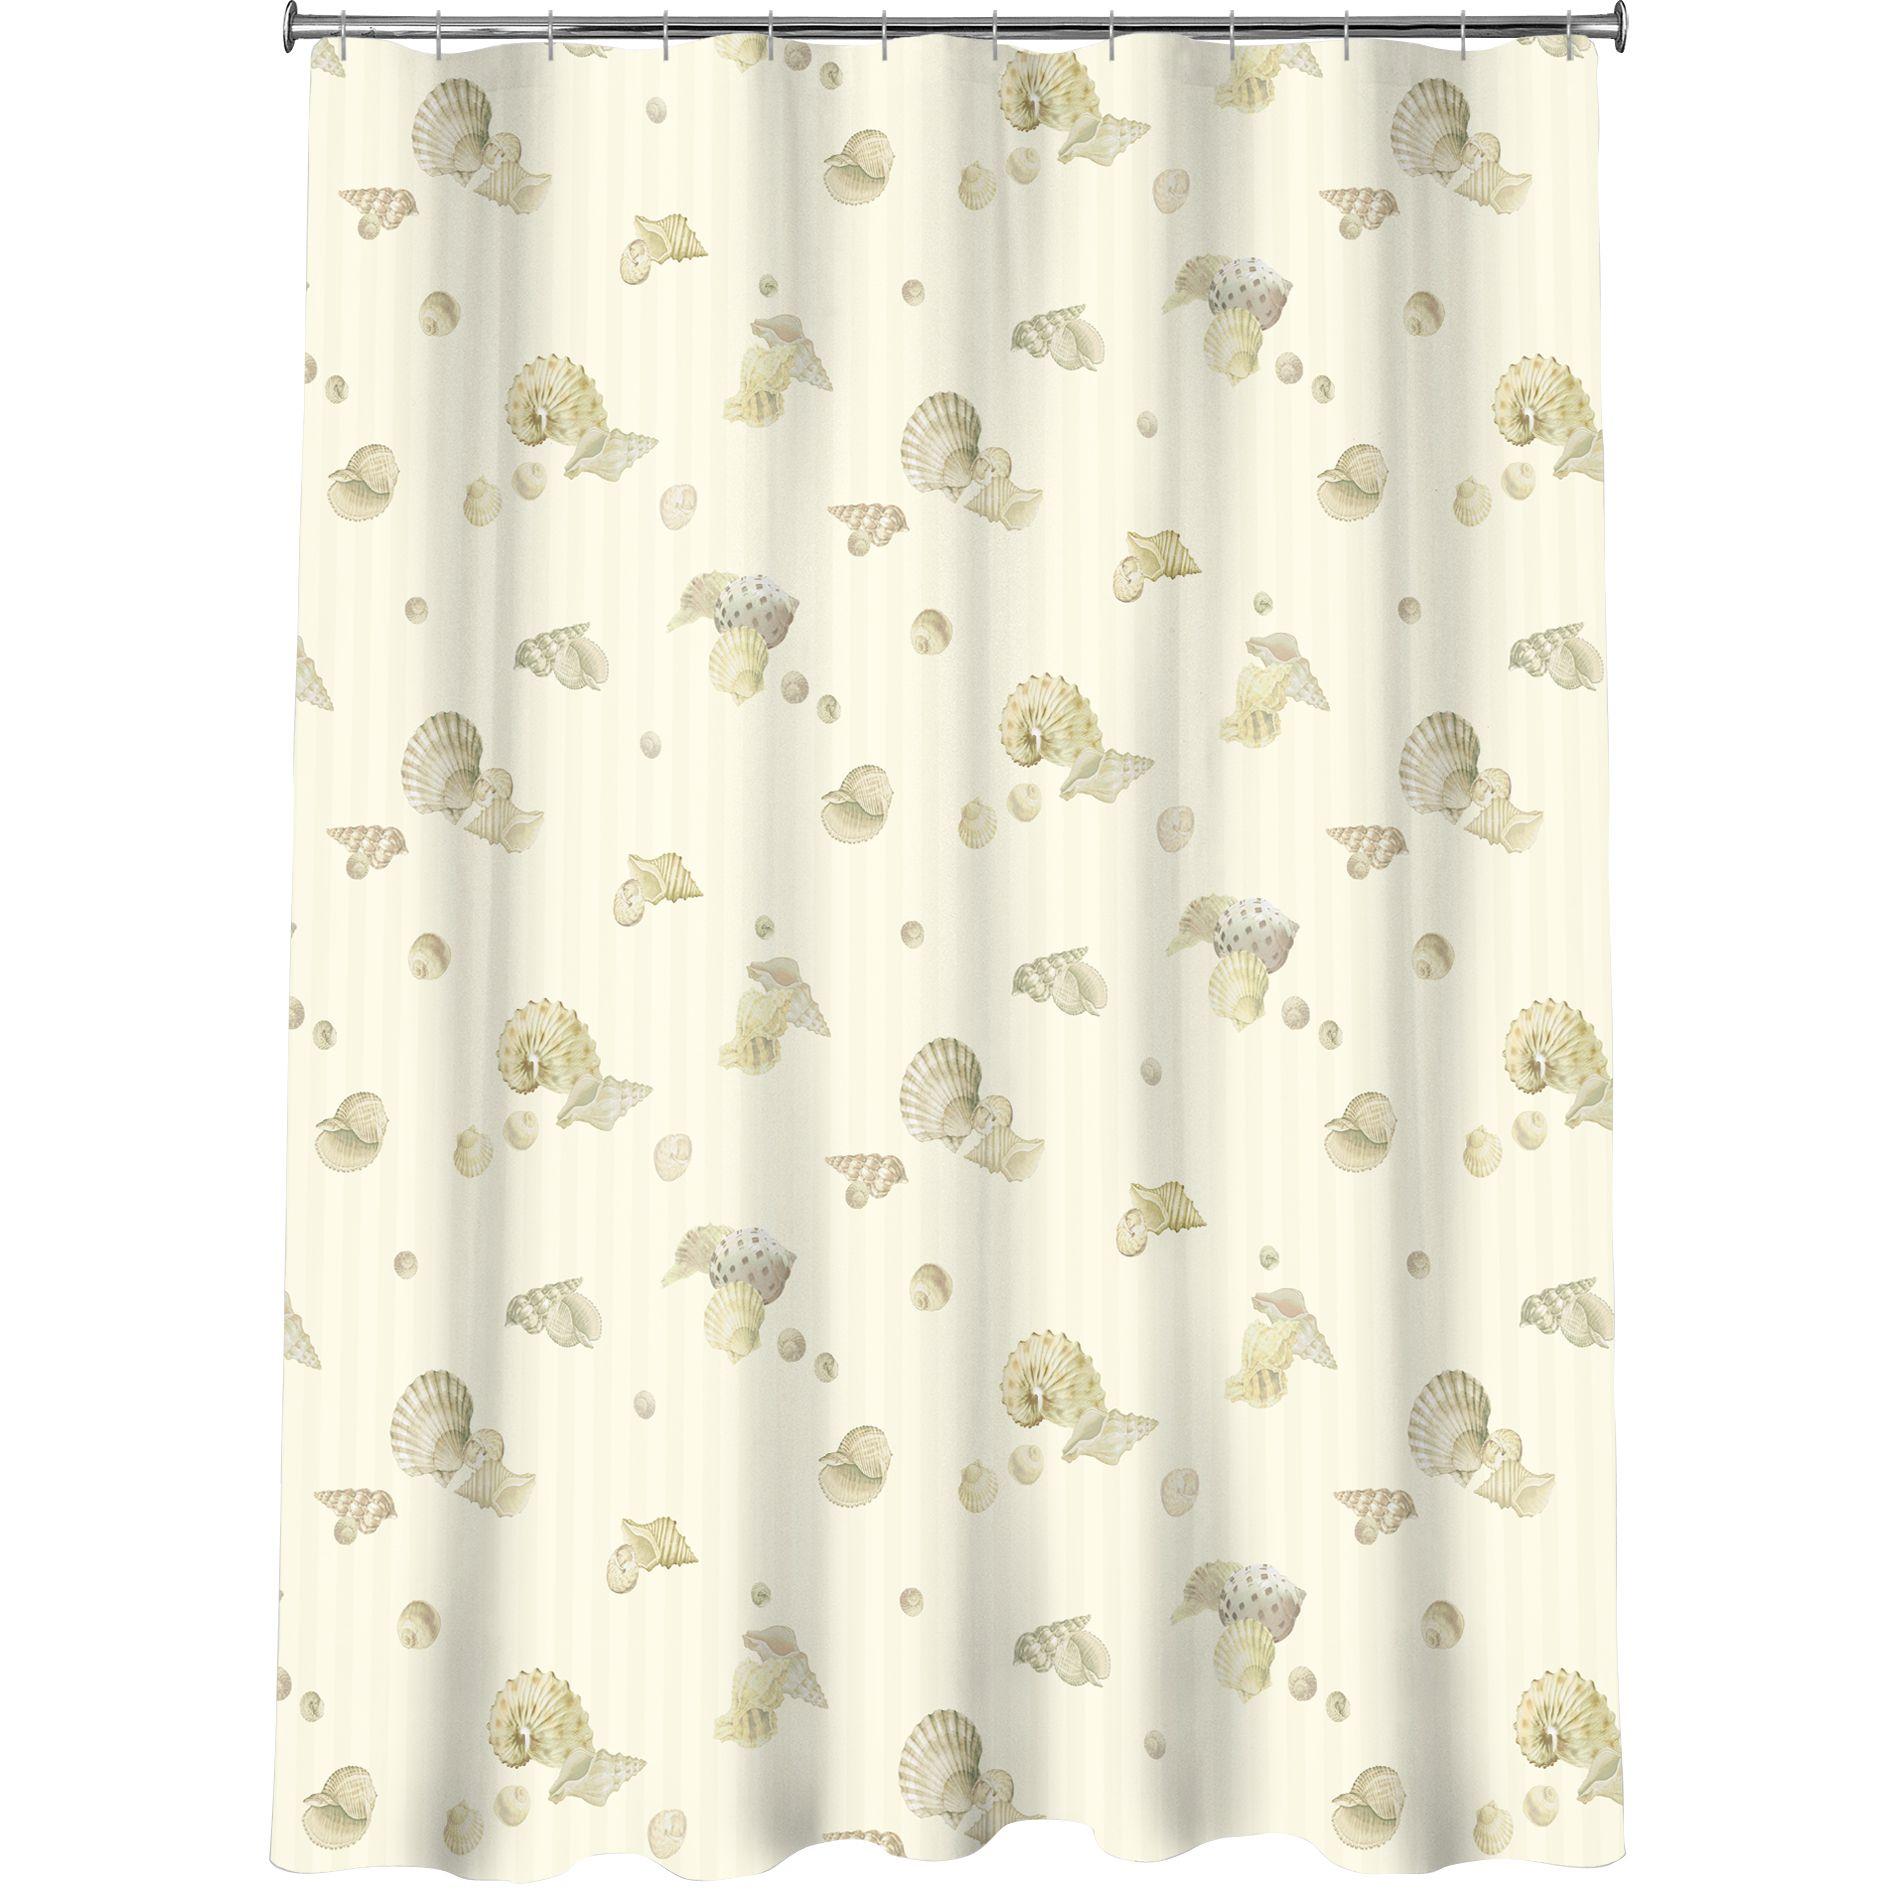 Essential Home Pearl Shells Shower Curtain